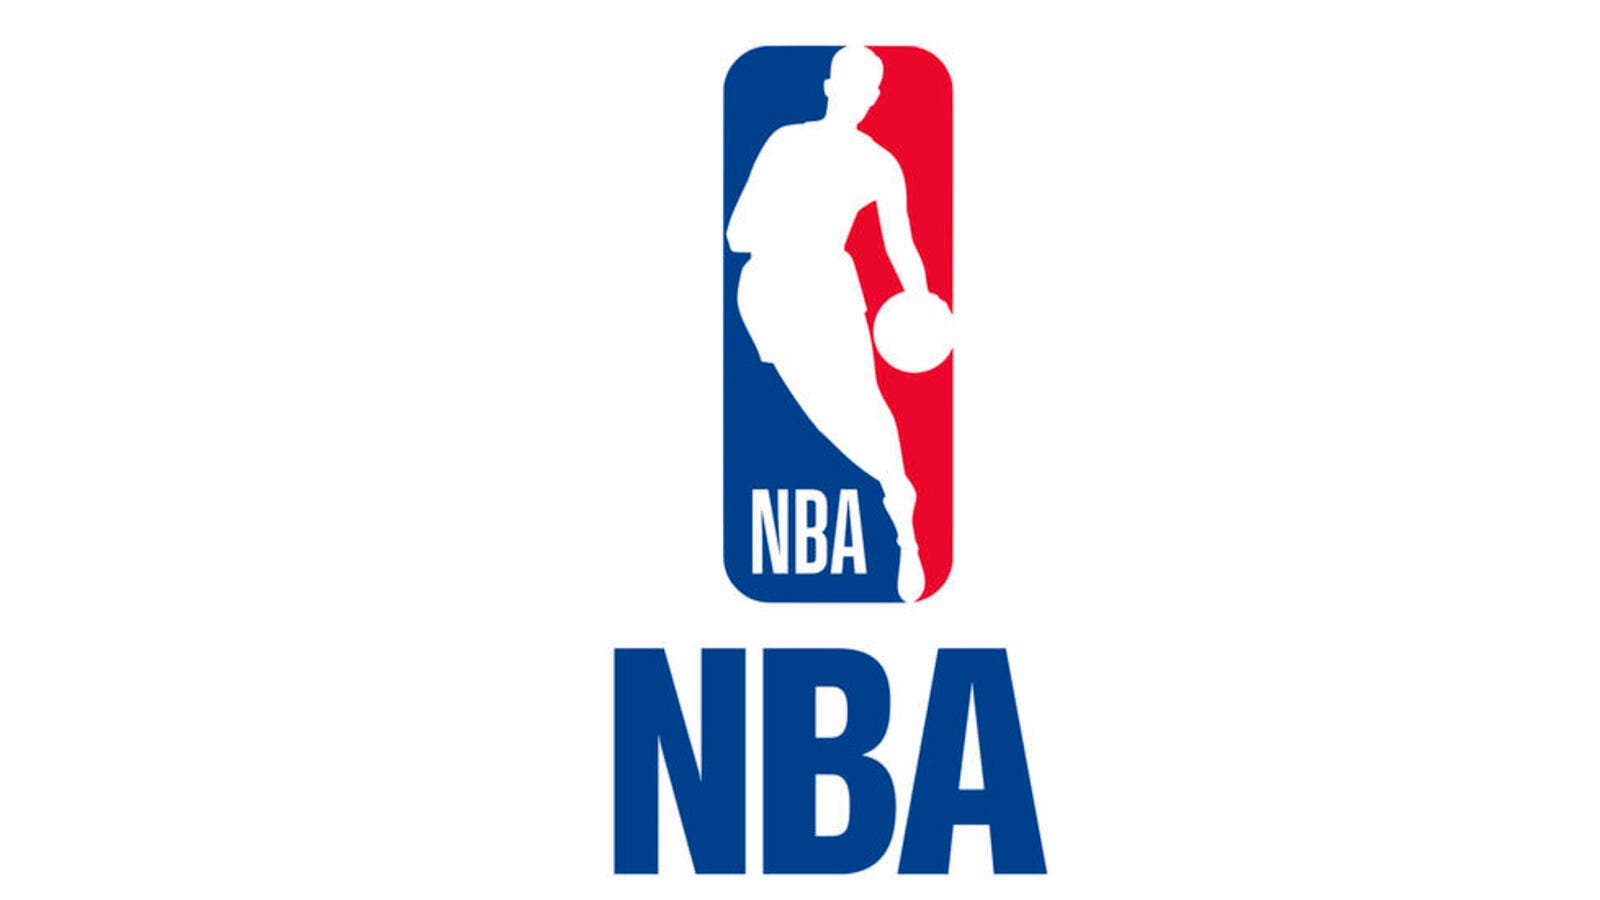 Watch/FREE: LA Lakers vs Miami Heat Game 1 Live Stream NBA Final Online 2020